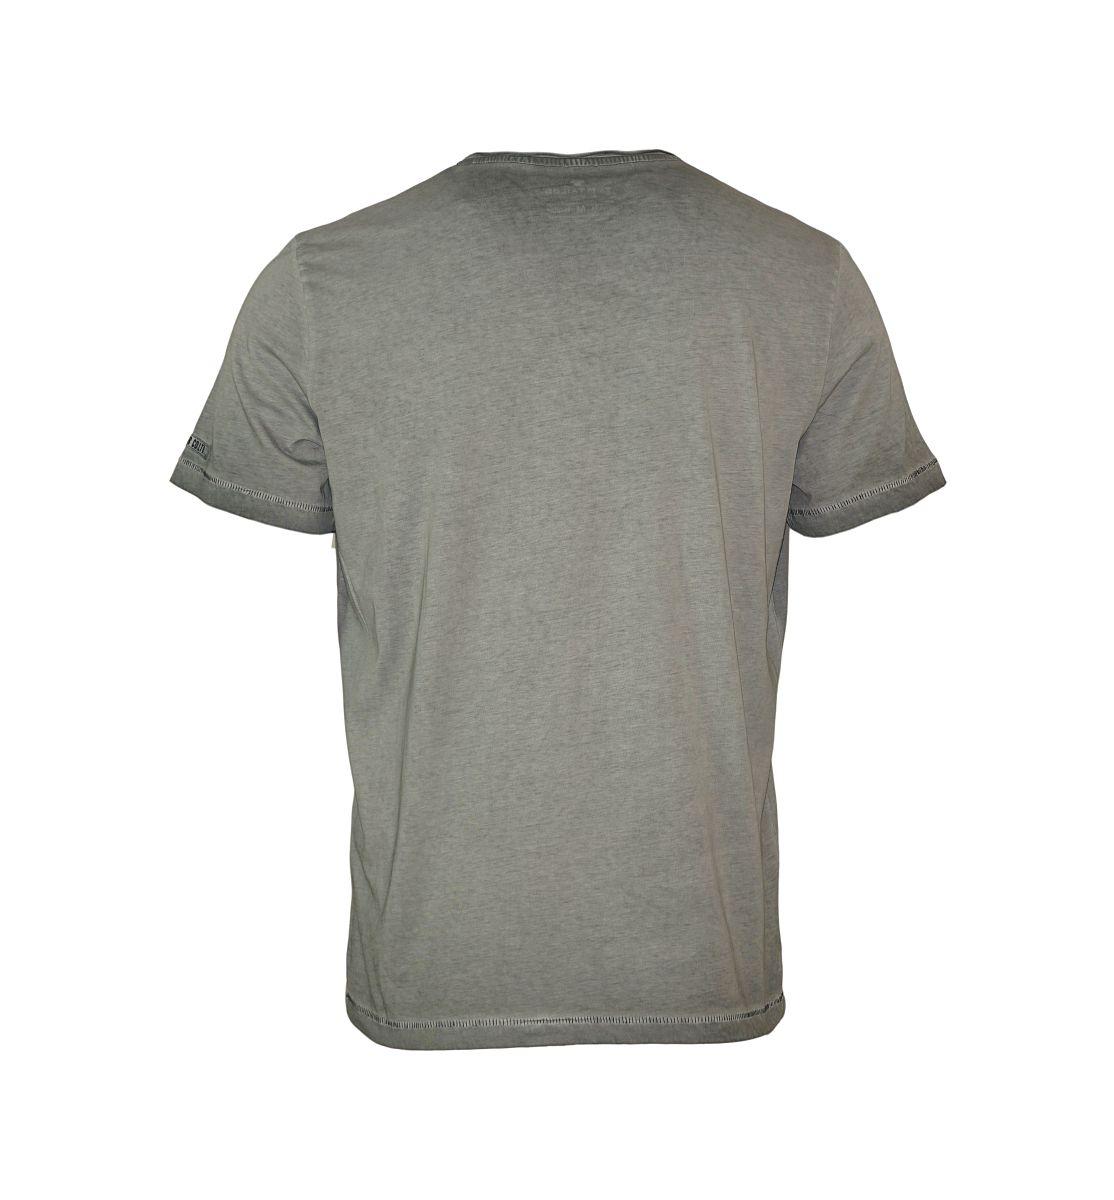 Tom Tailor Shirt T-Shirt Tee-Shirt Motorcycle prints tee grau 10340739910 2983